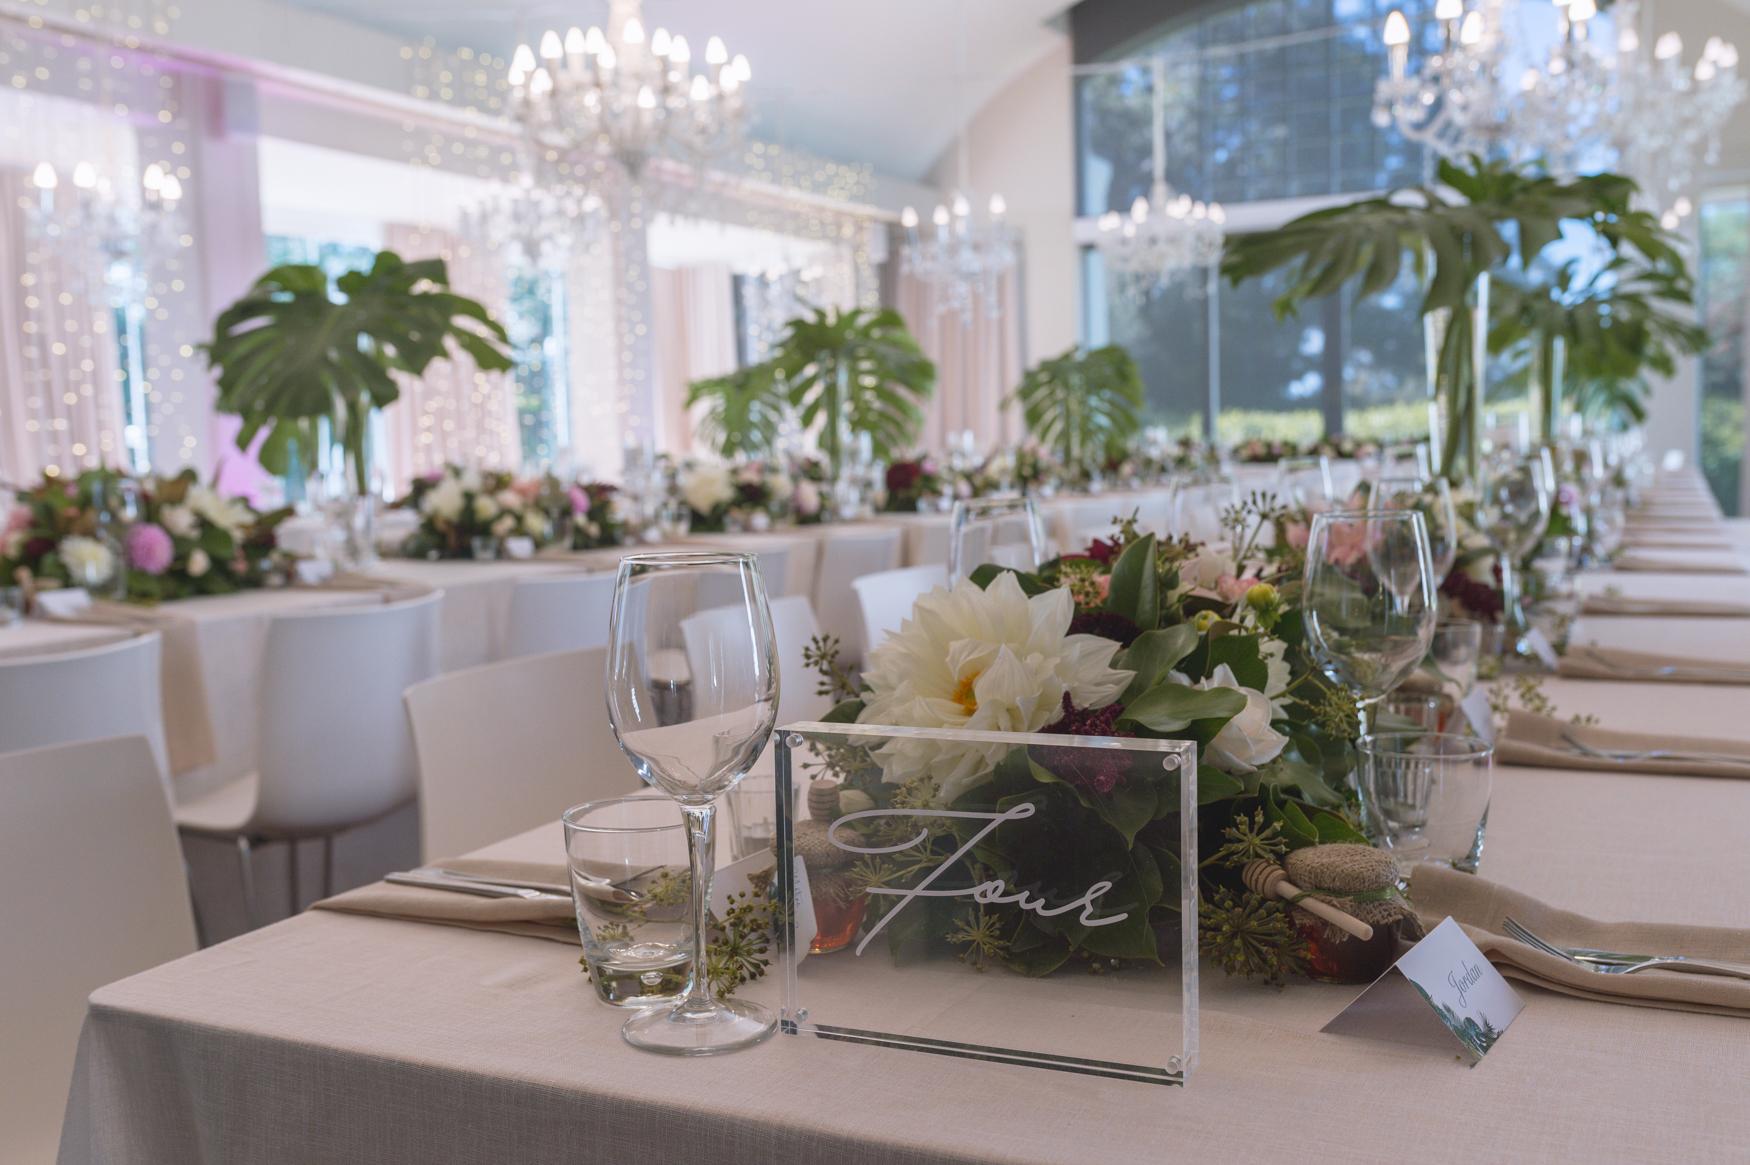 Leon_&_Martine's_Wedding_Photographs_17th_April_2019_@johnhenryweddingphoto_Low_Resolution_Web-007.JPG